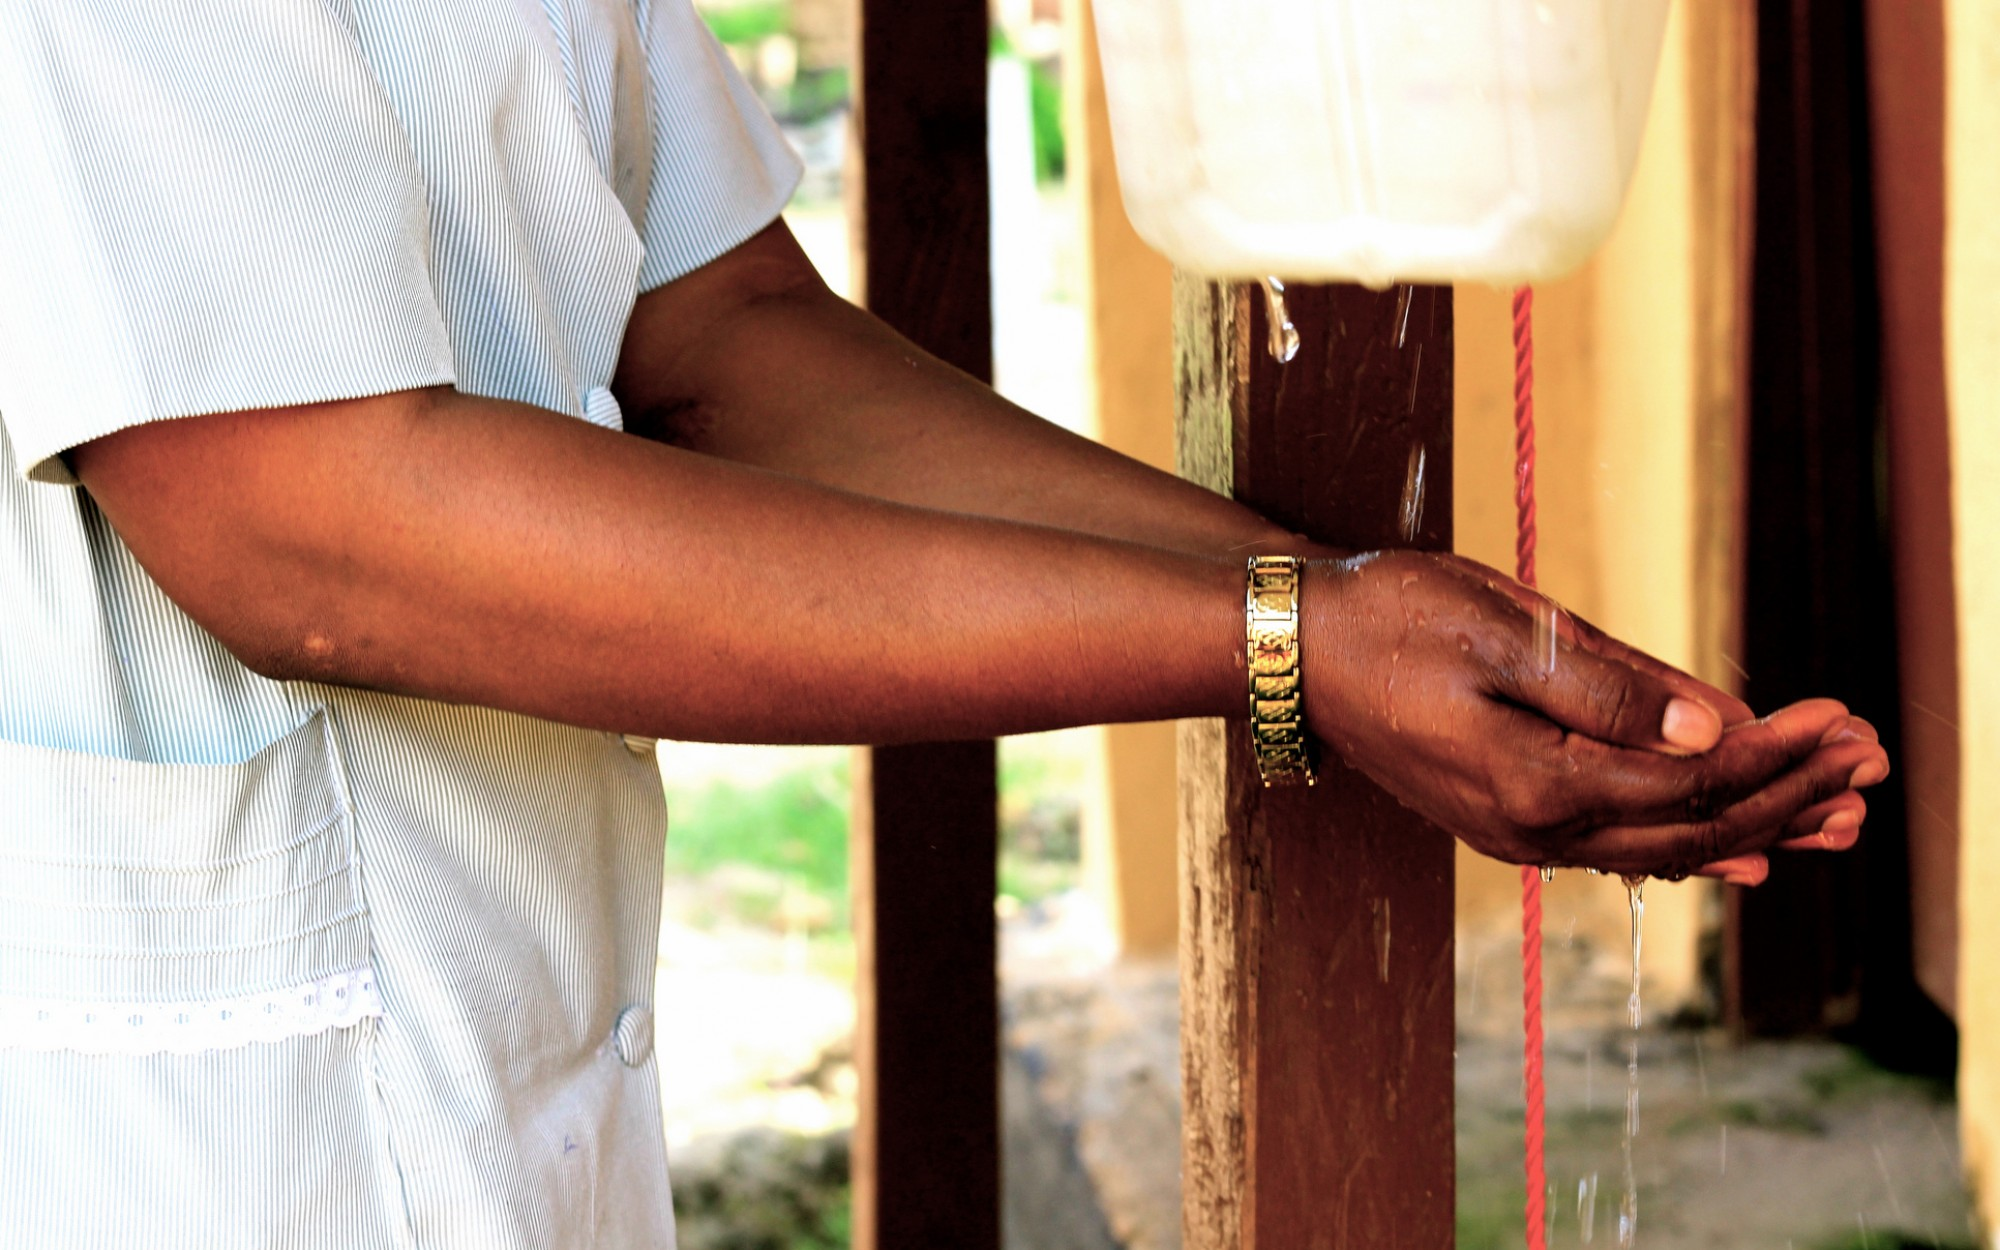 Innovation in hand-washing, Sierra Leone